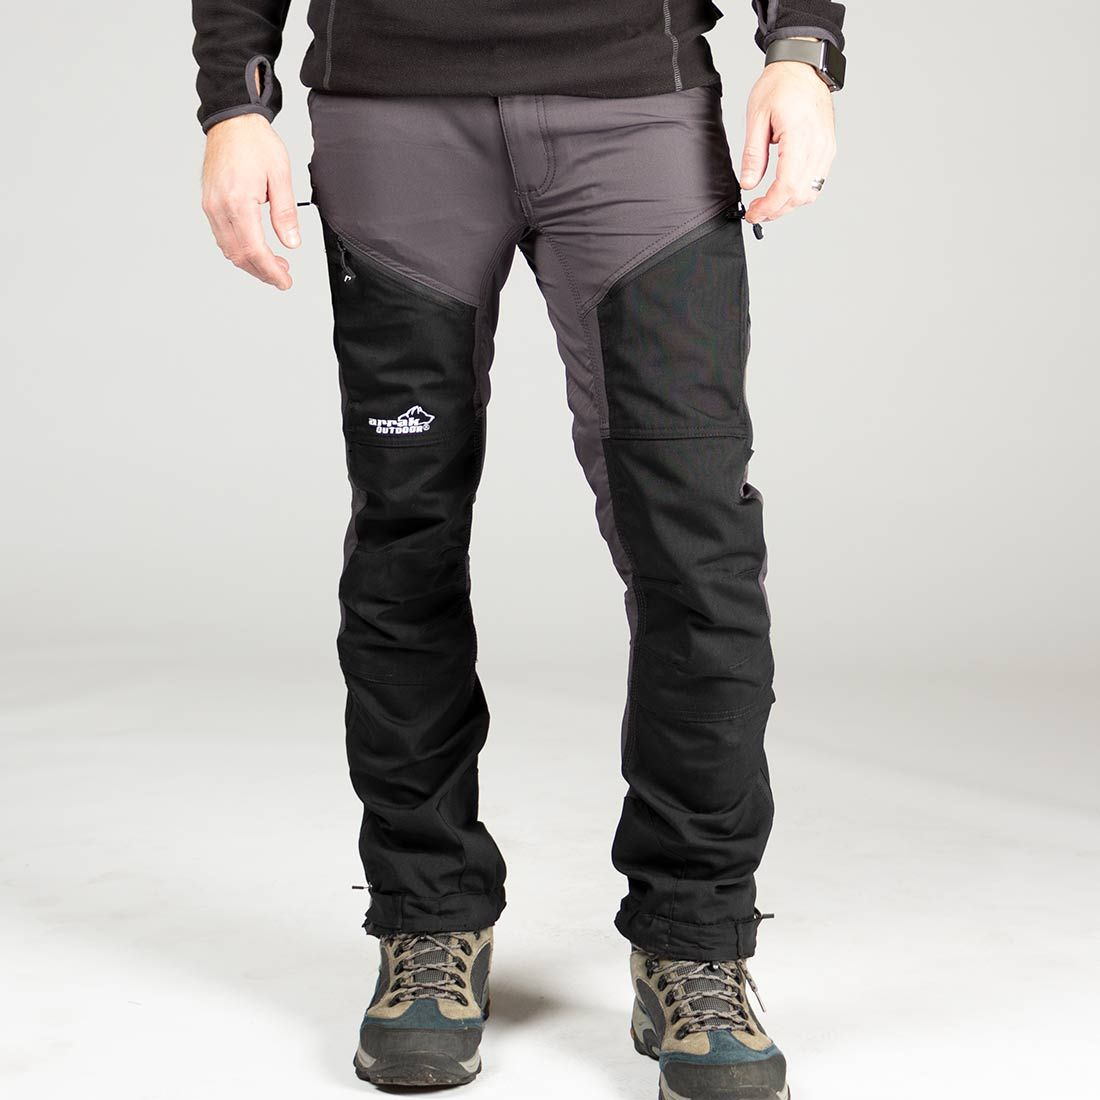 Arrak Rough Pant, Dark Grey 60